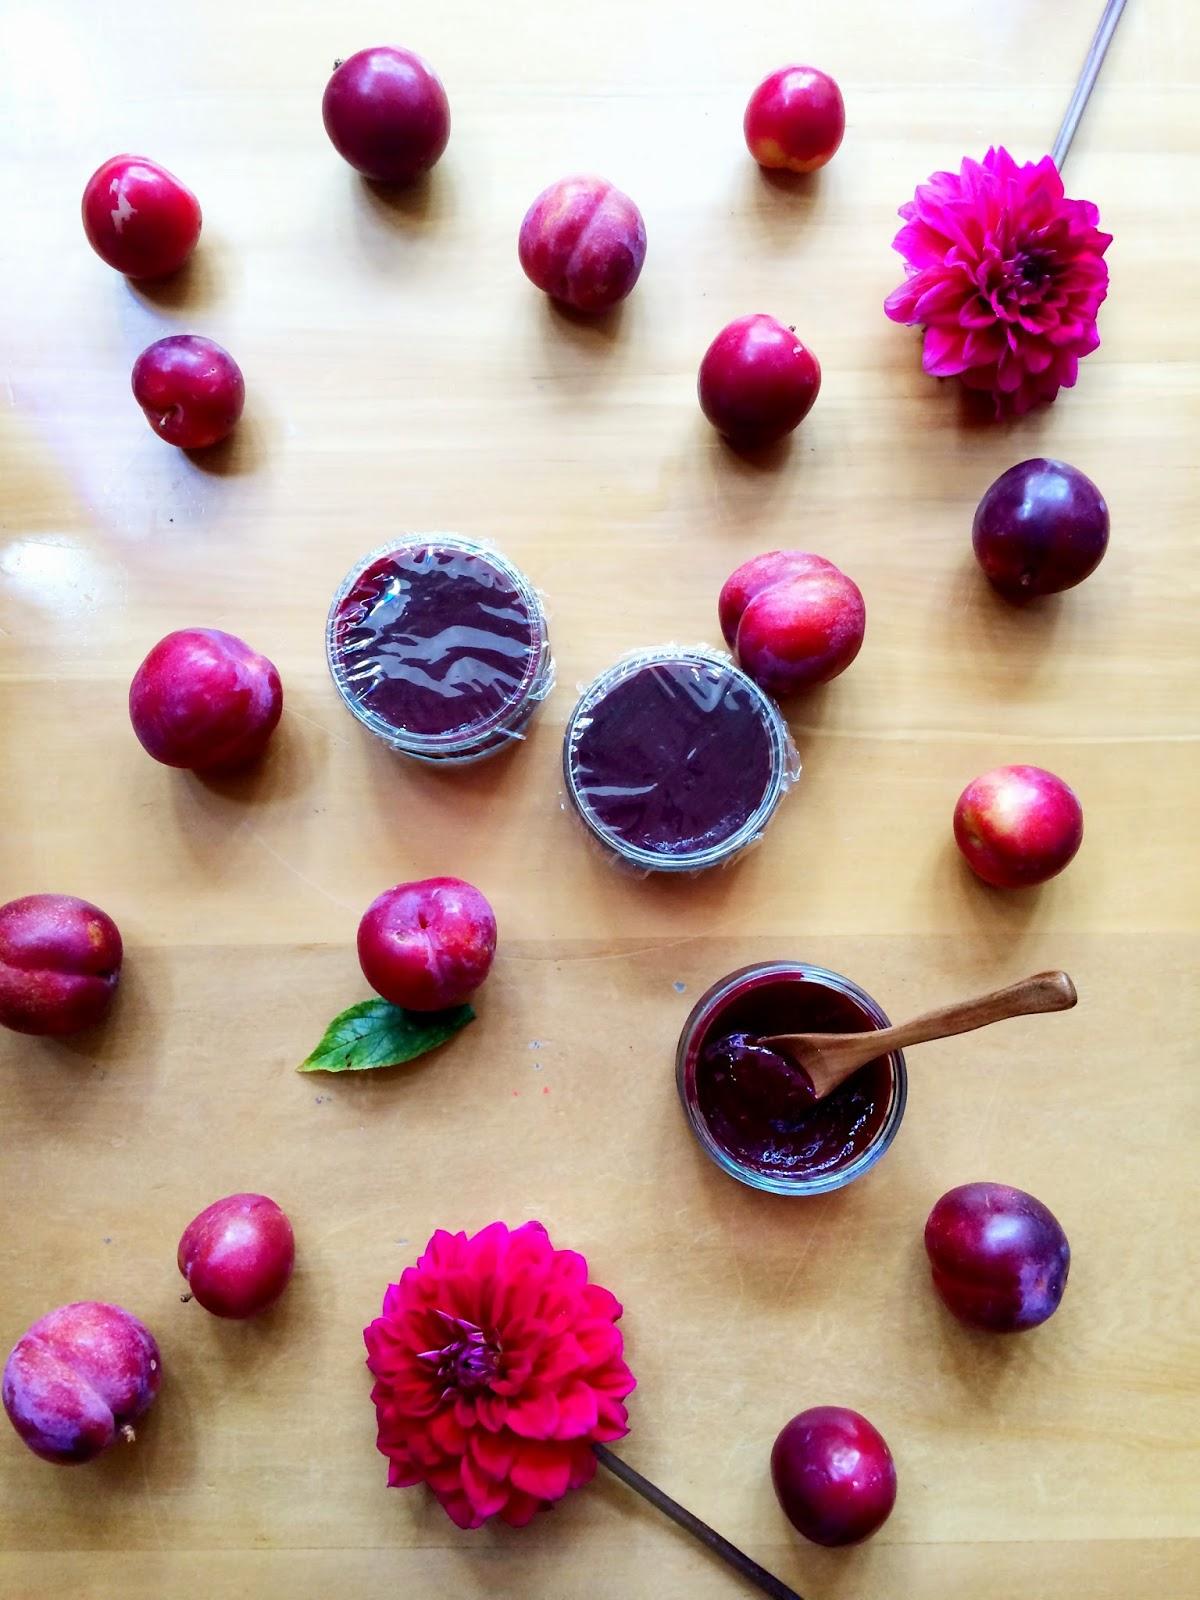 Homemade Flower Preservative Vegan Recipes Plum Jam With Brown Sugar